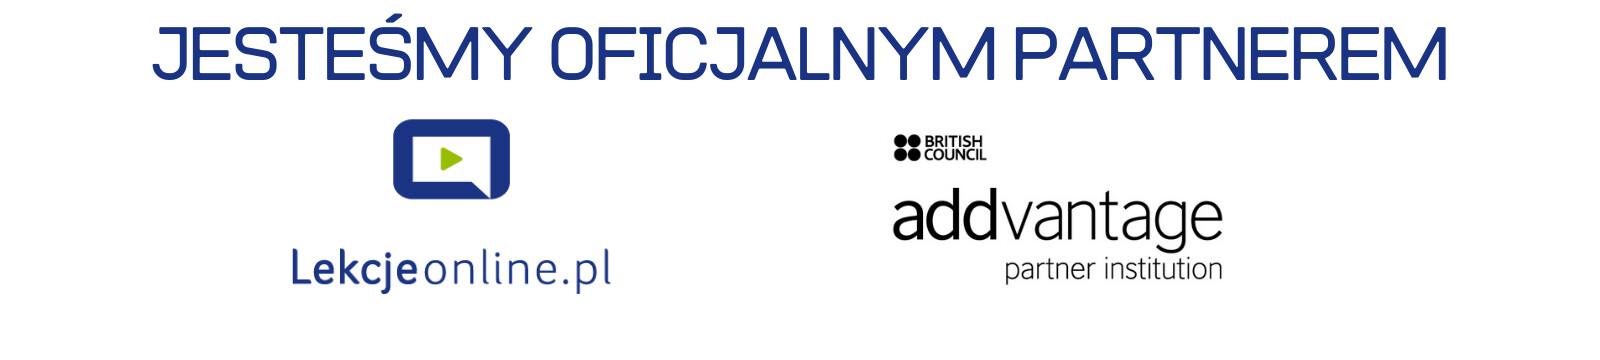 Jesteśmy oficjalnym partnerem british council addvantage partner institution